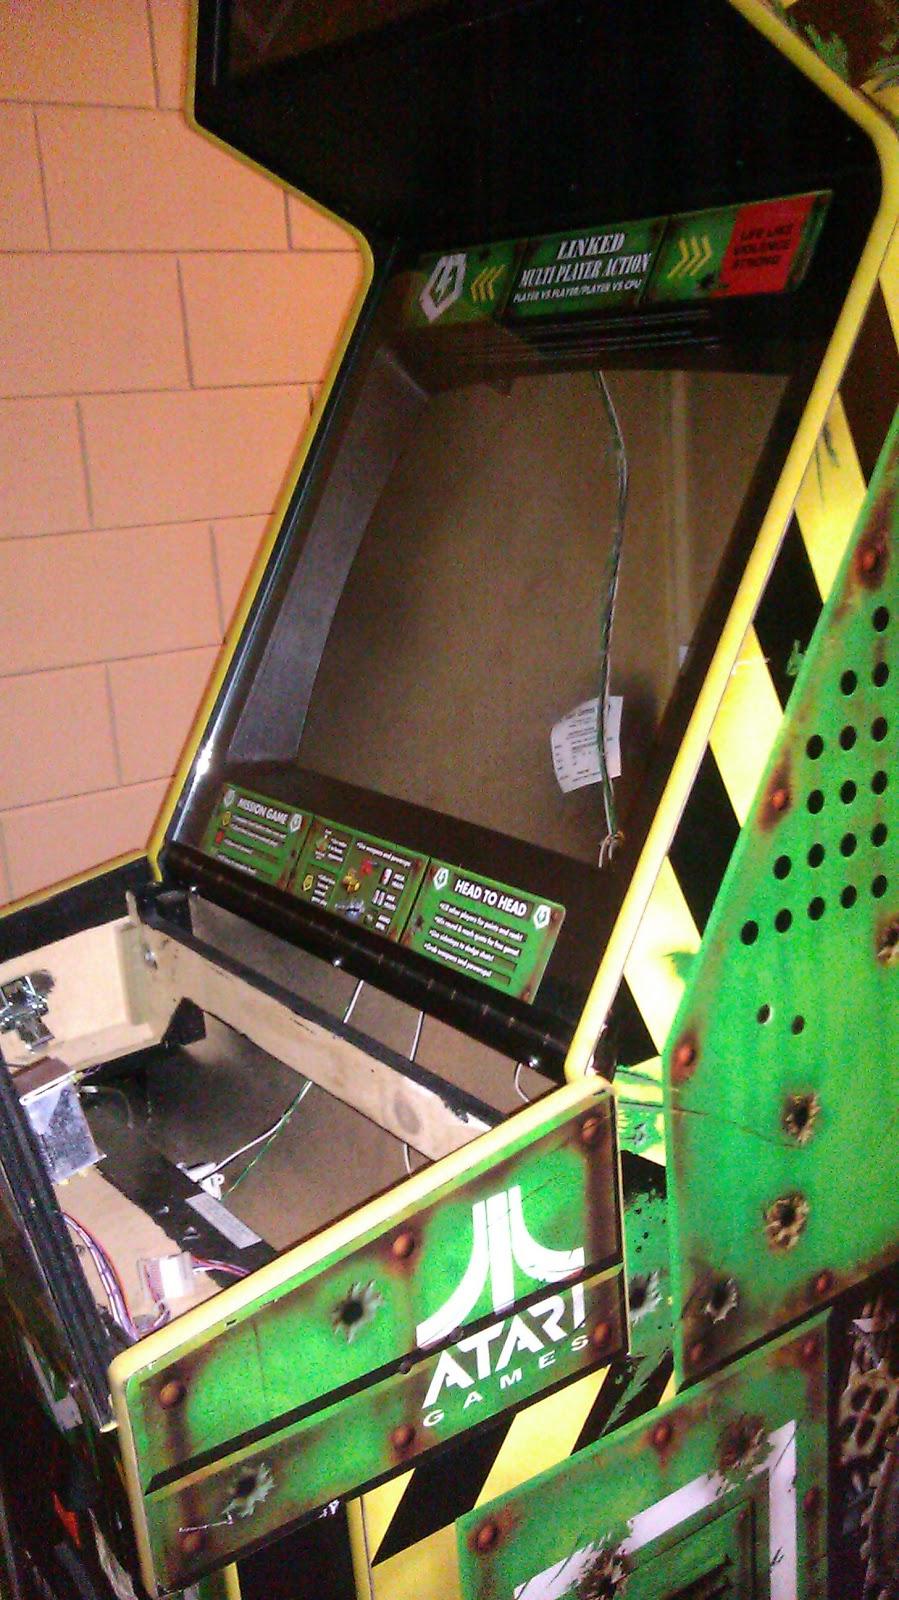 Gaming Gadgets And Mods Arcade Cabinet Using Original